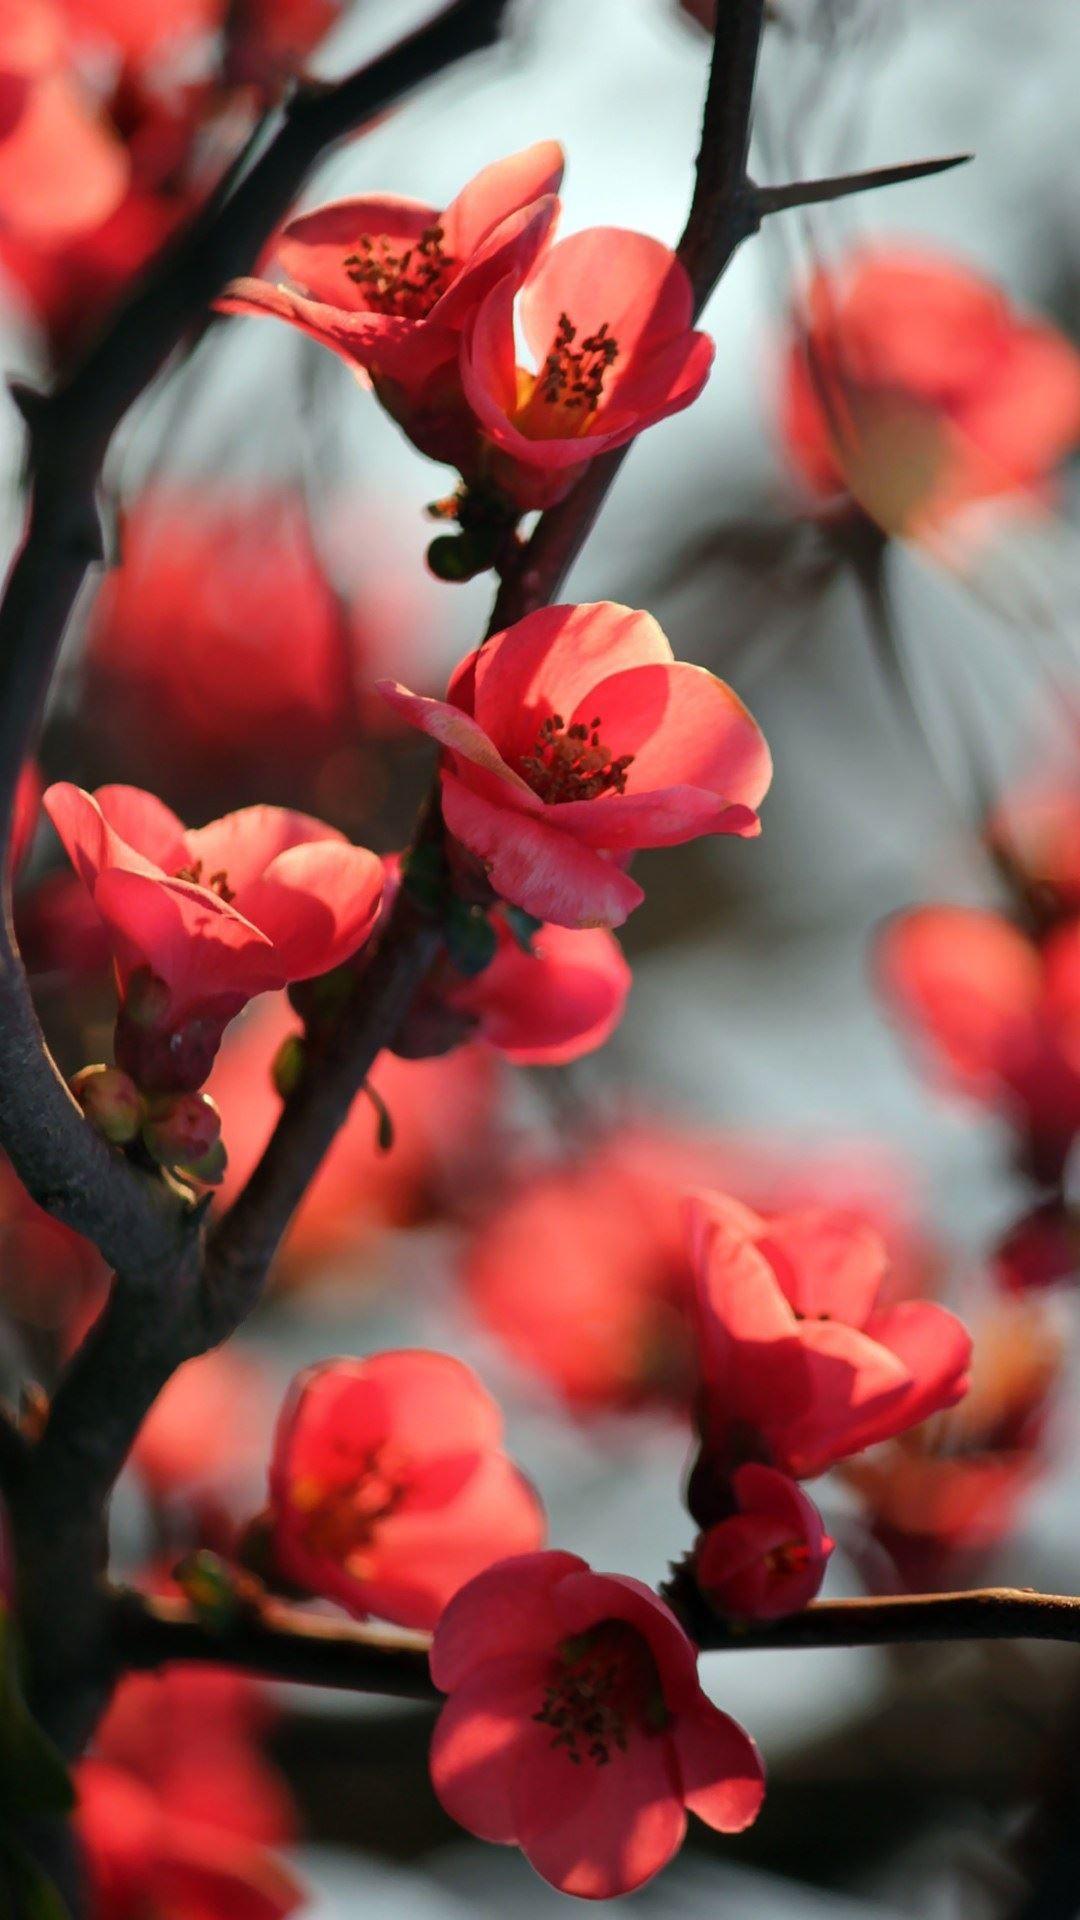 Pin By Z On Wallpaper Cherry Blossom Wallpaper Cherry